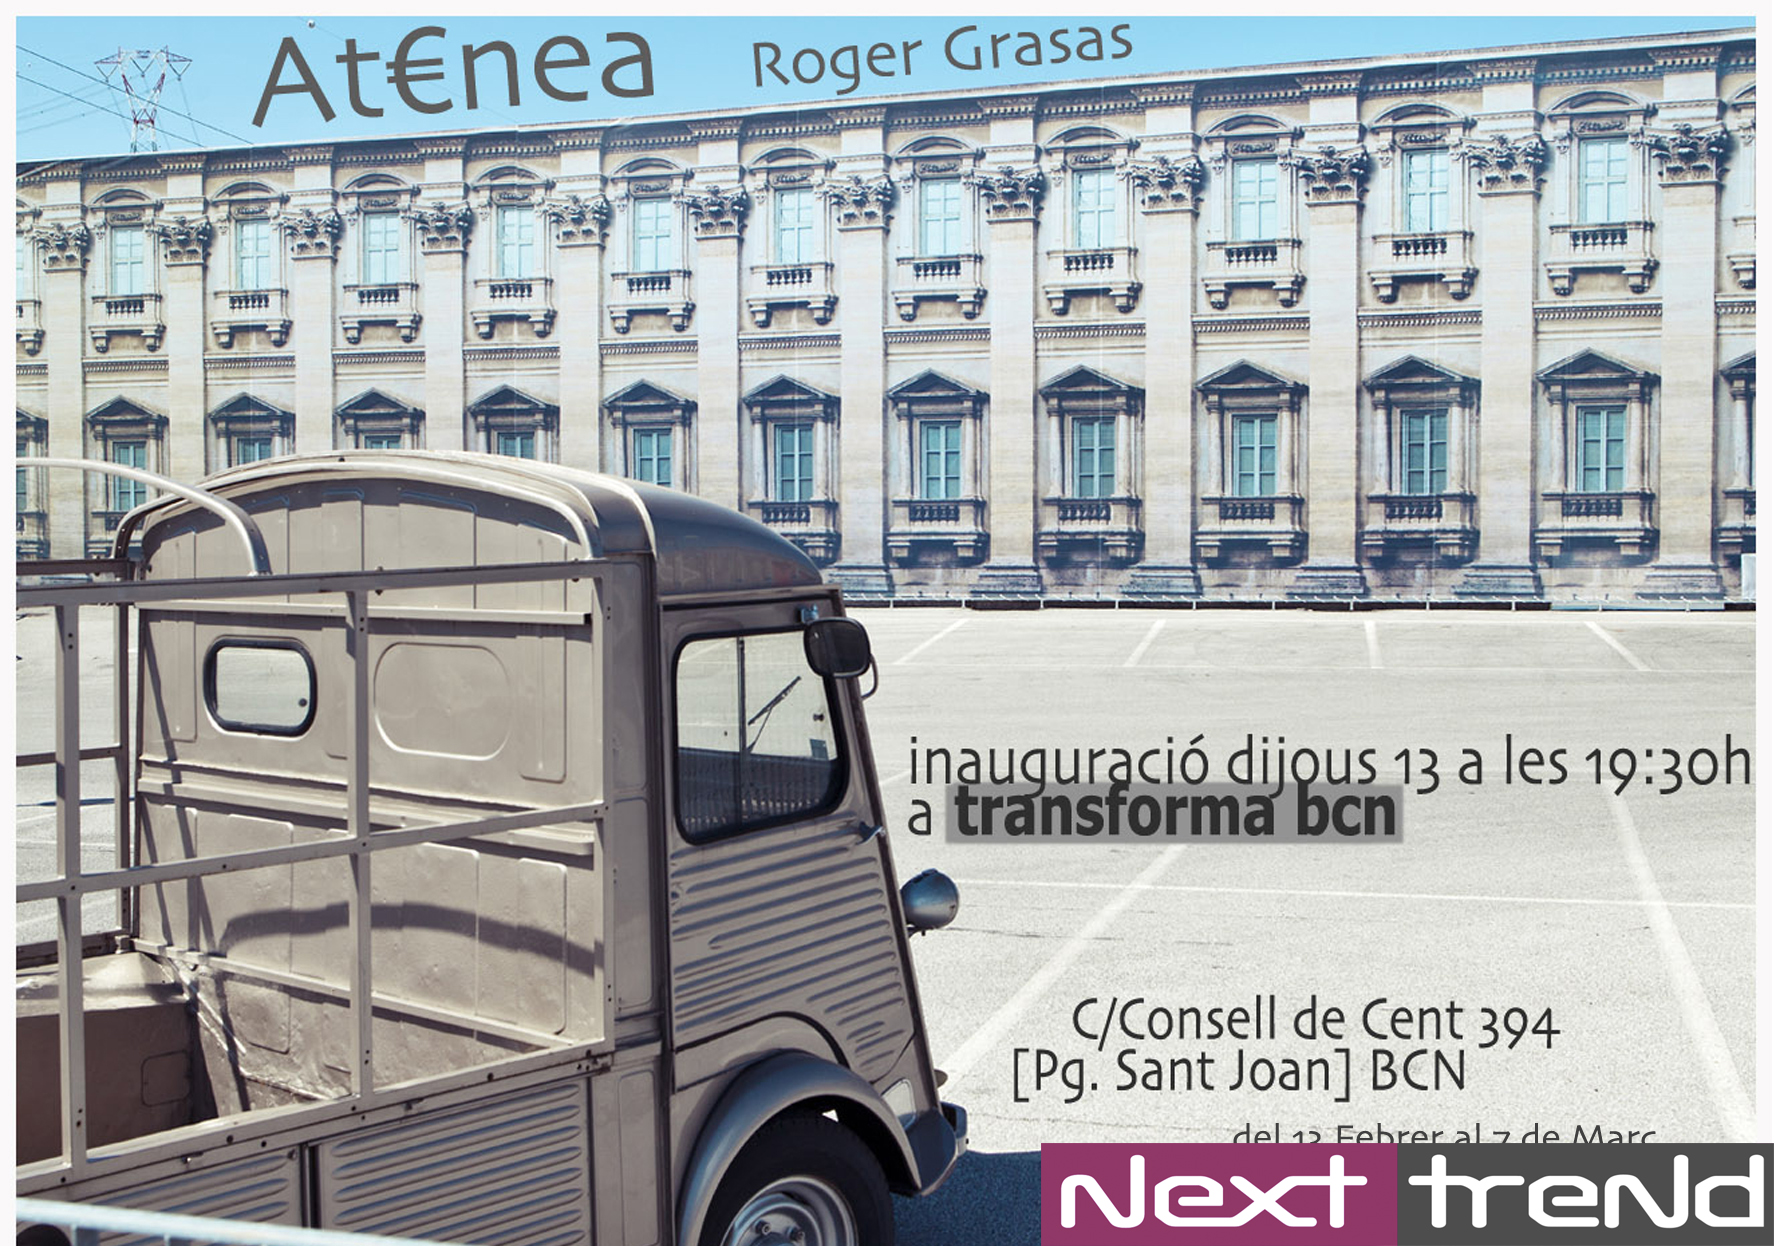 Inauguracion-exposicion-at€nea-roger-grasas-nexttrend-fotografia